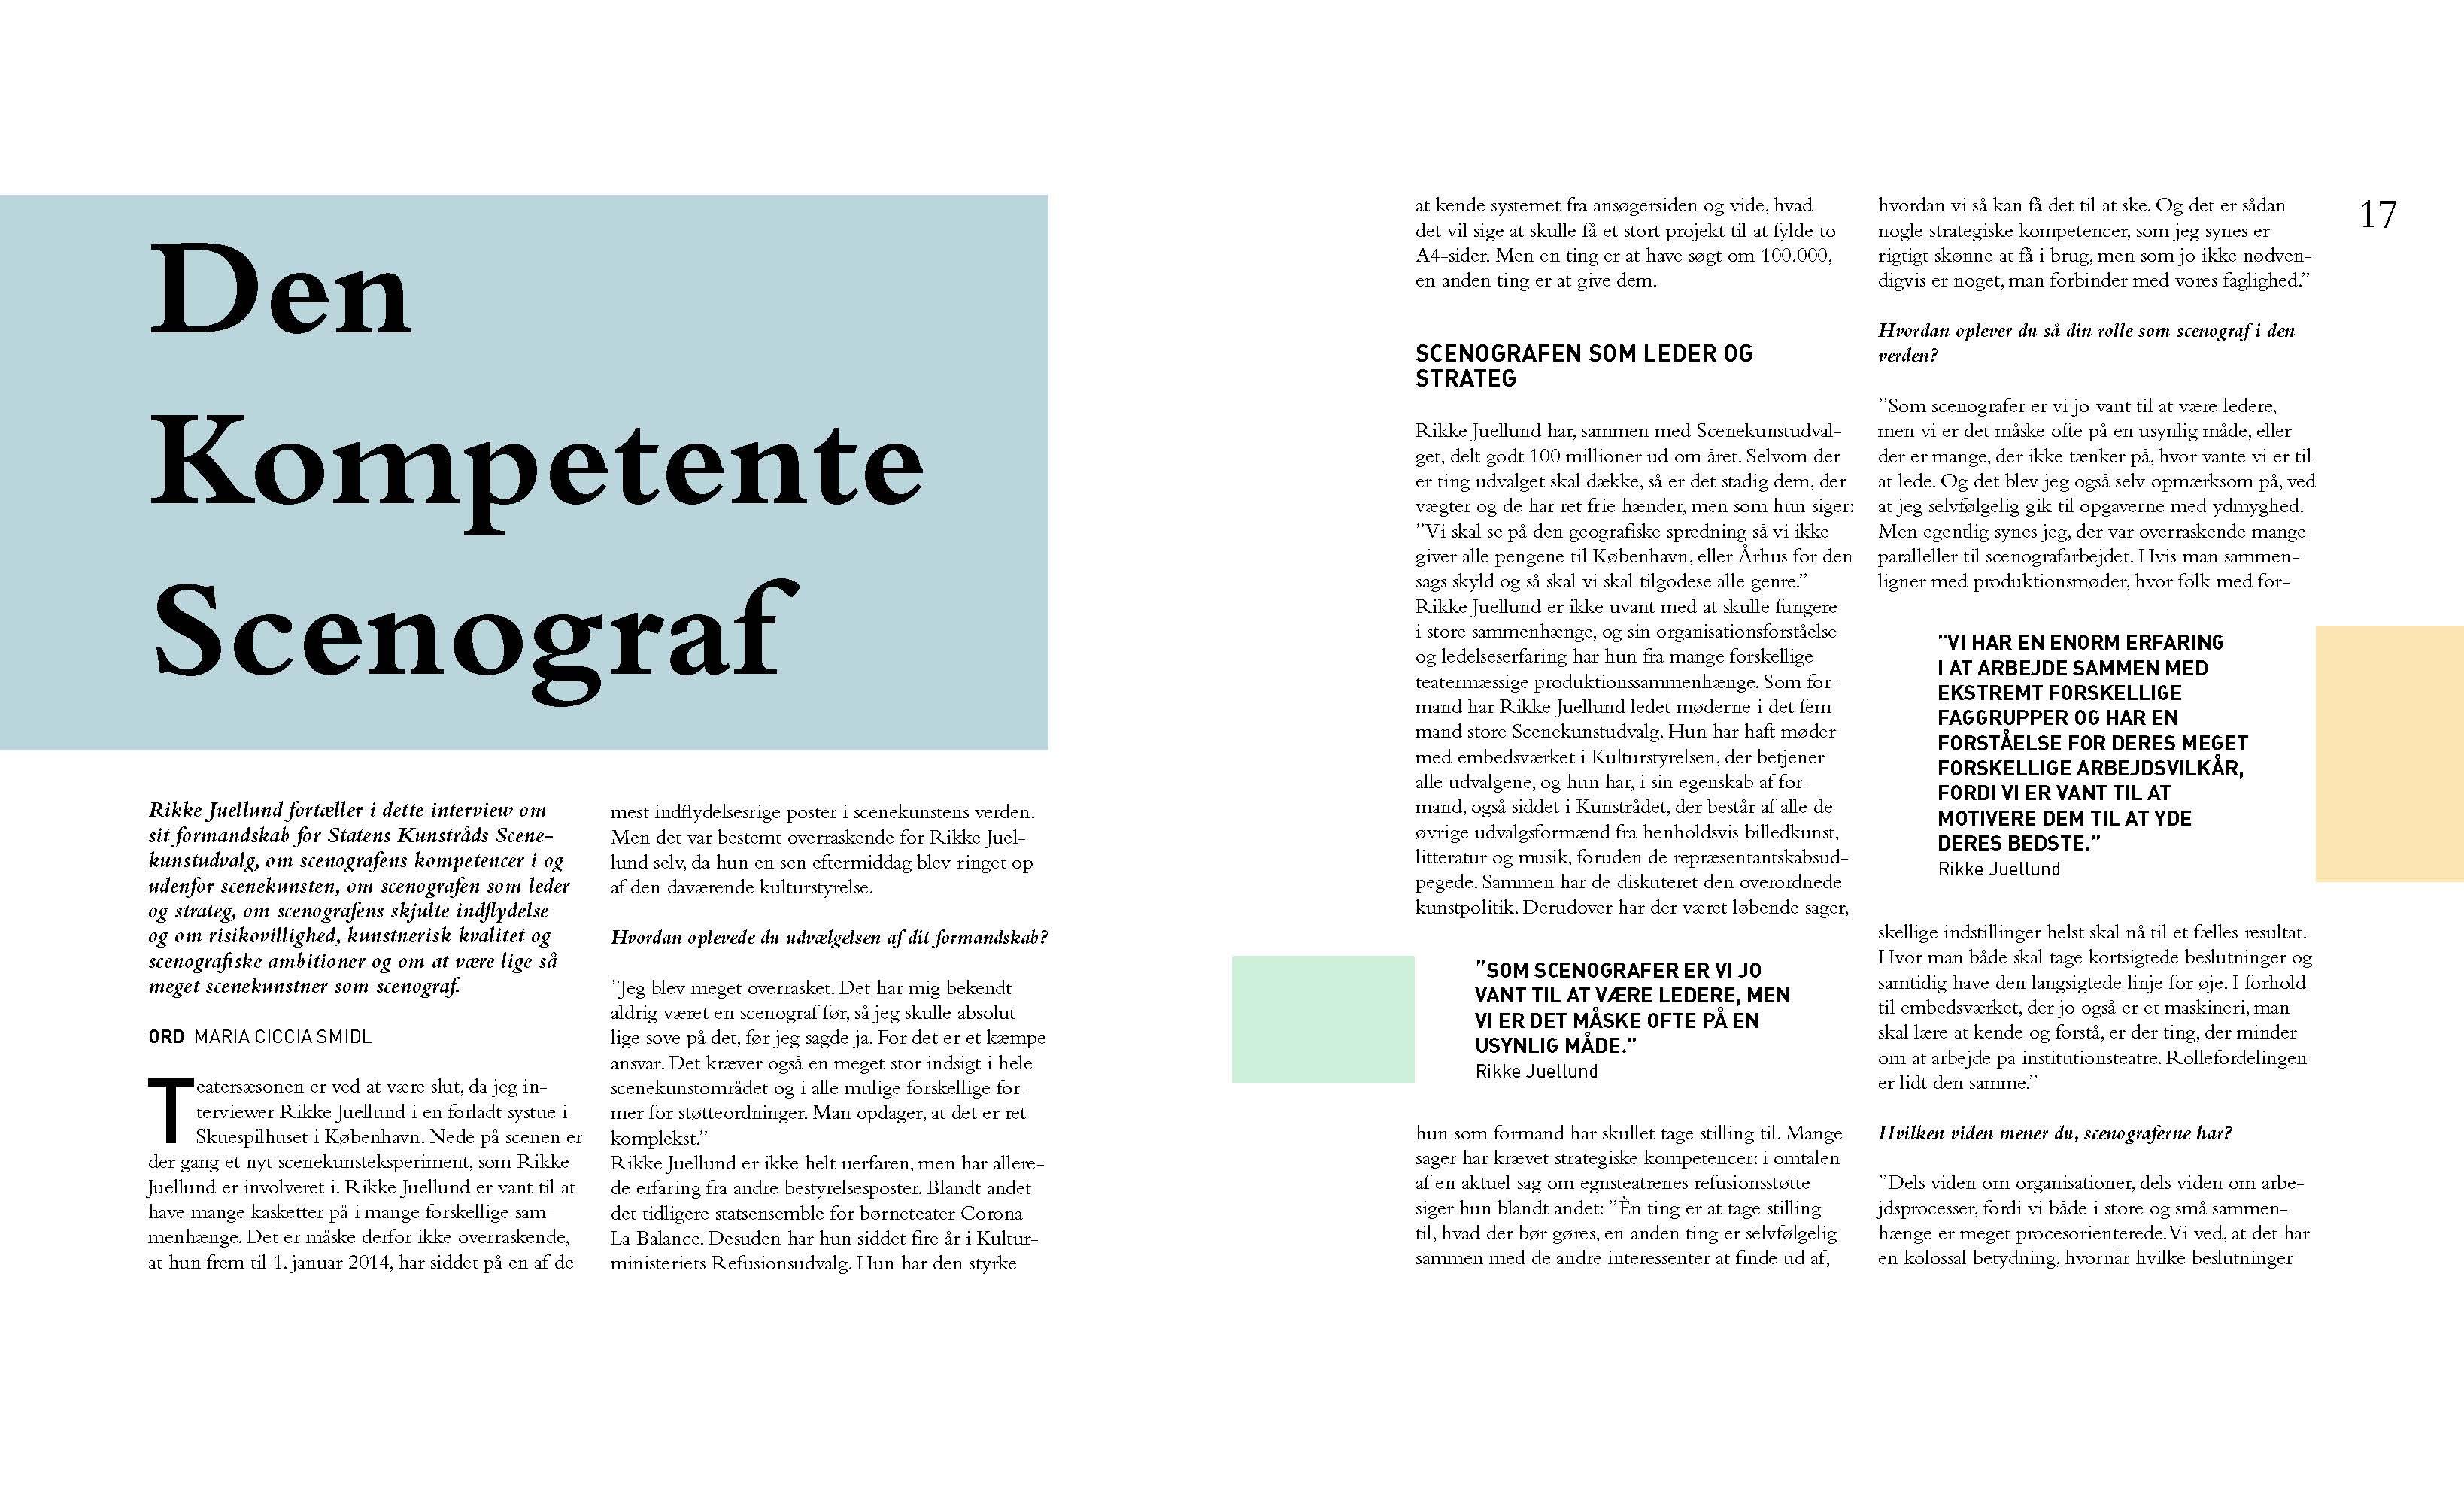 Den_kompetente_scenograf_Page_1